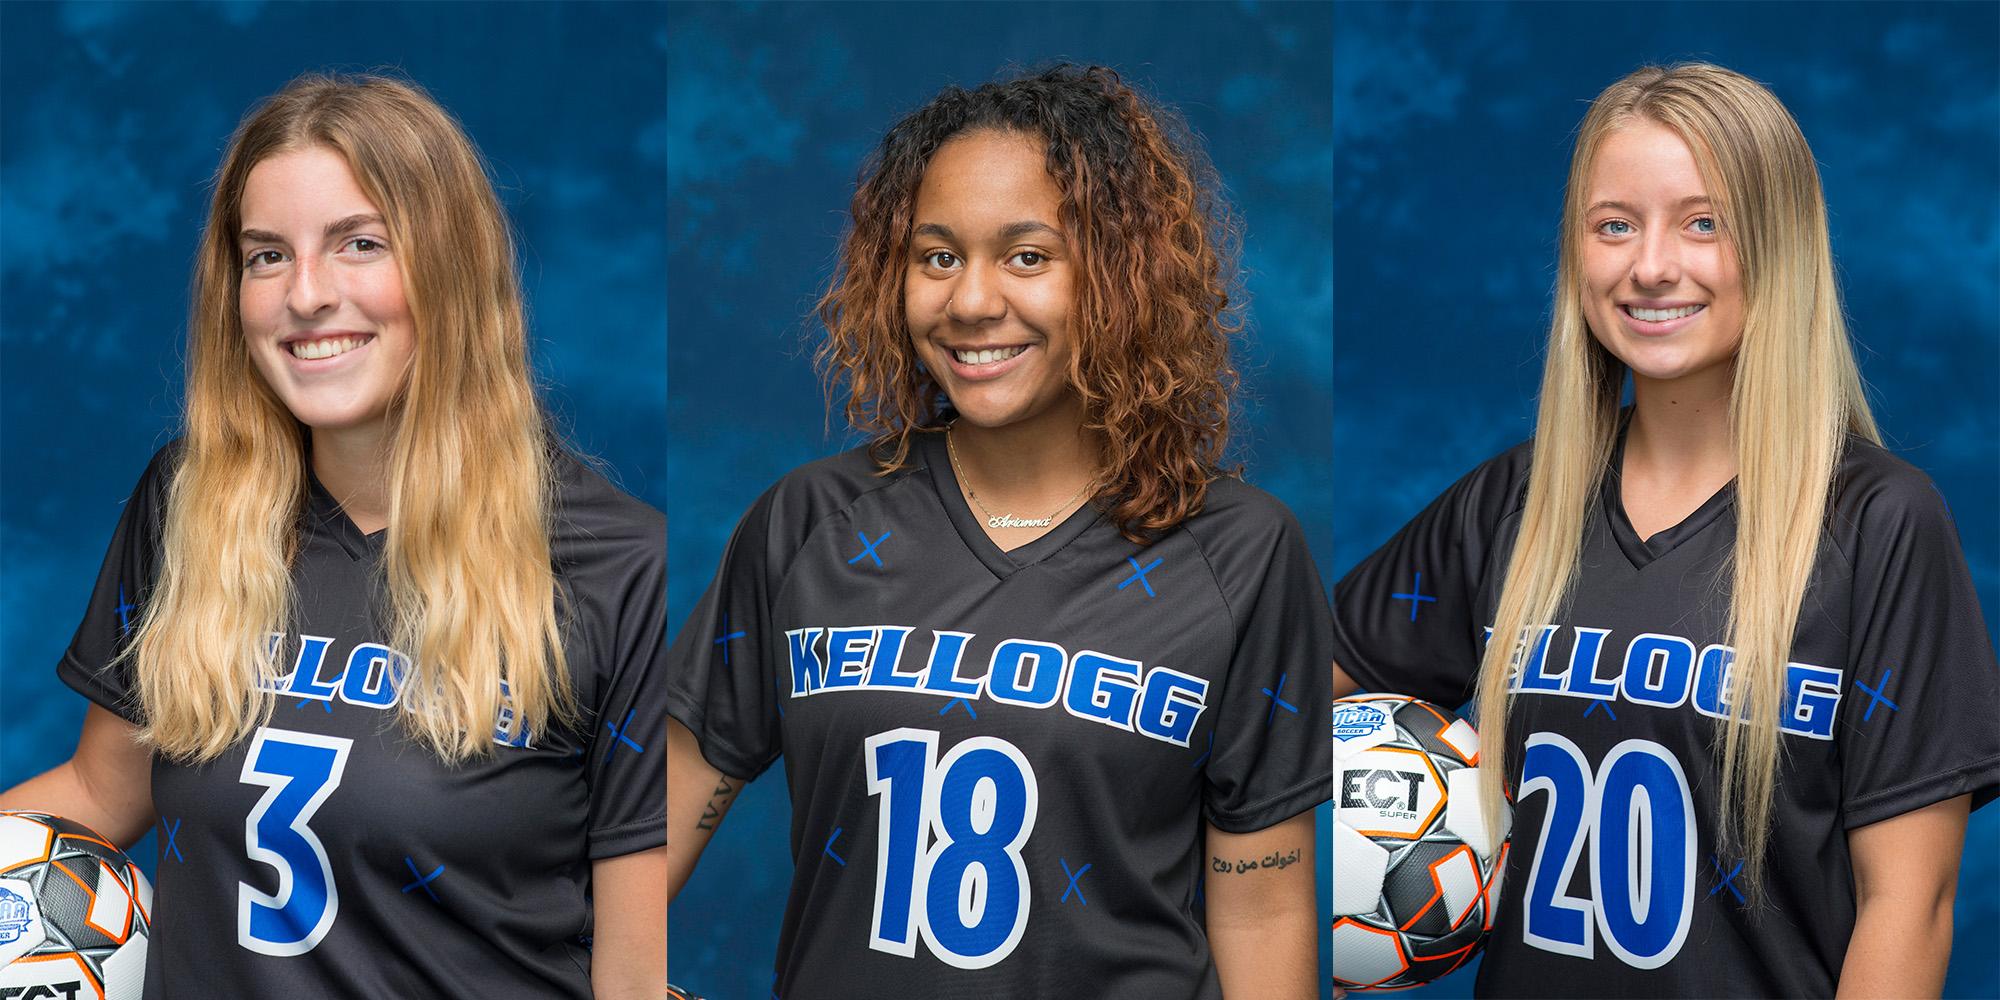 KCC women's soccer players Rachel Bammer, Arianna Cardenas-Jones and Baylee Willis.